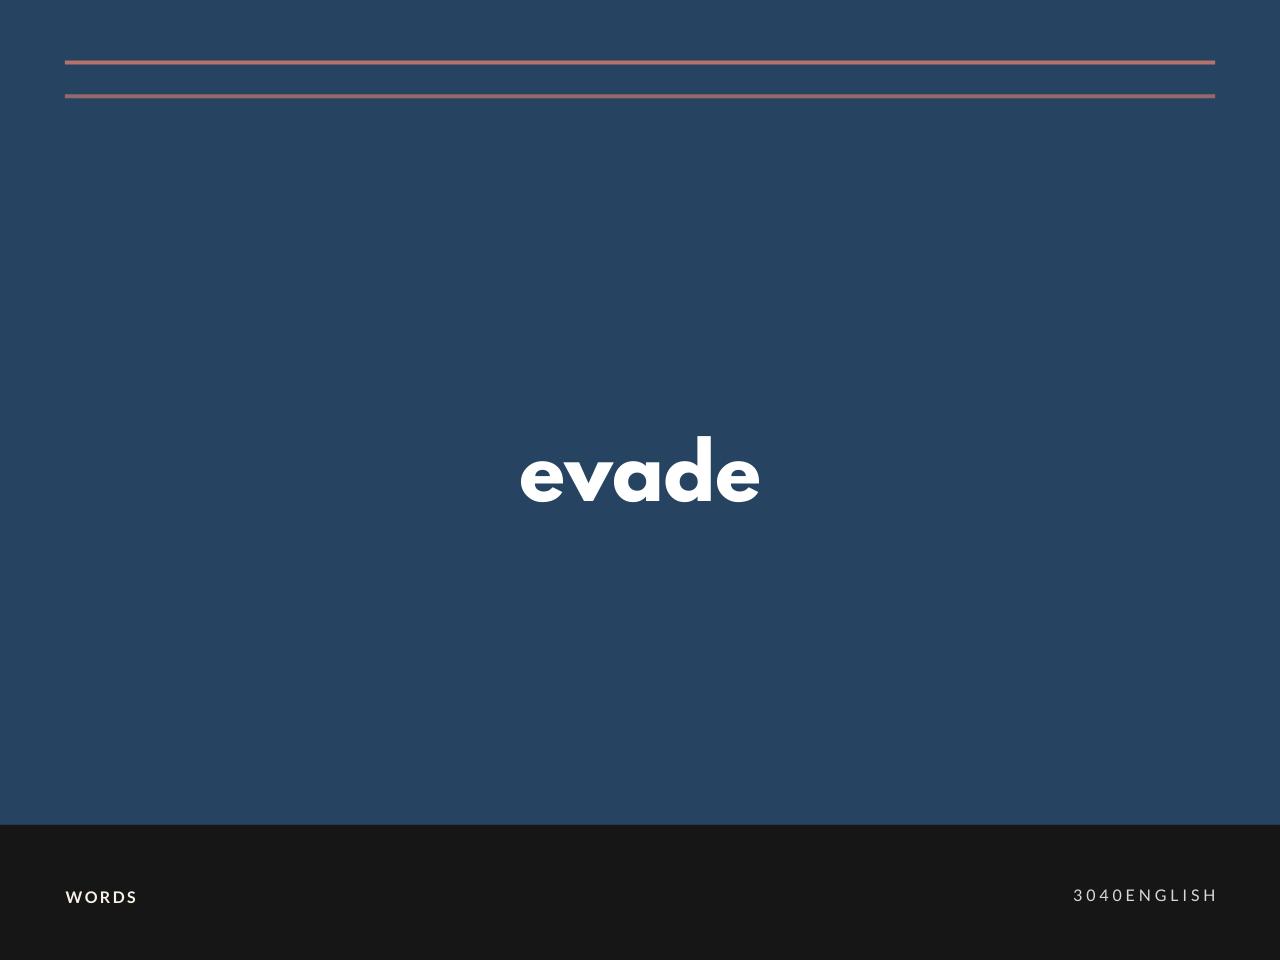 evade の意味と簡単な使い方【音読用例文あり】